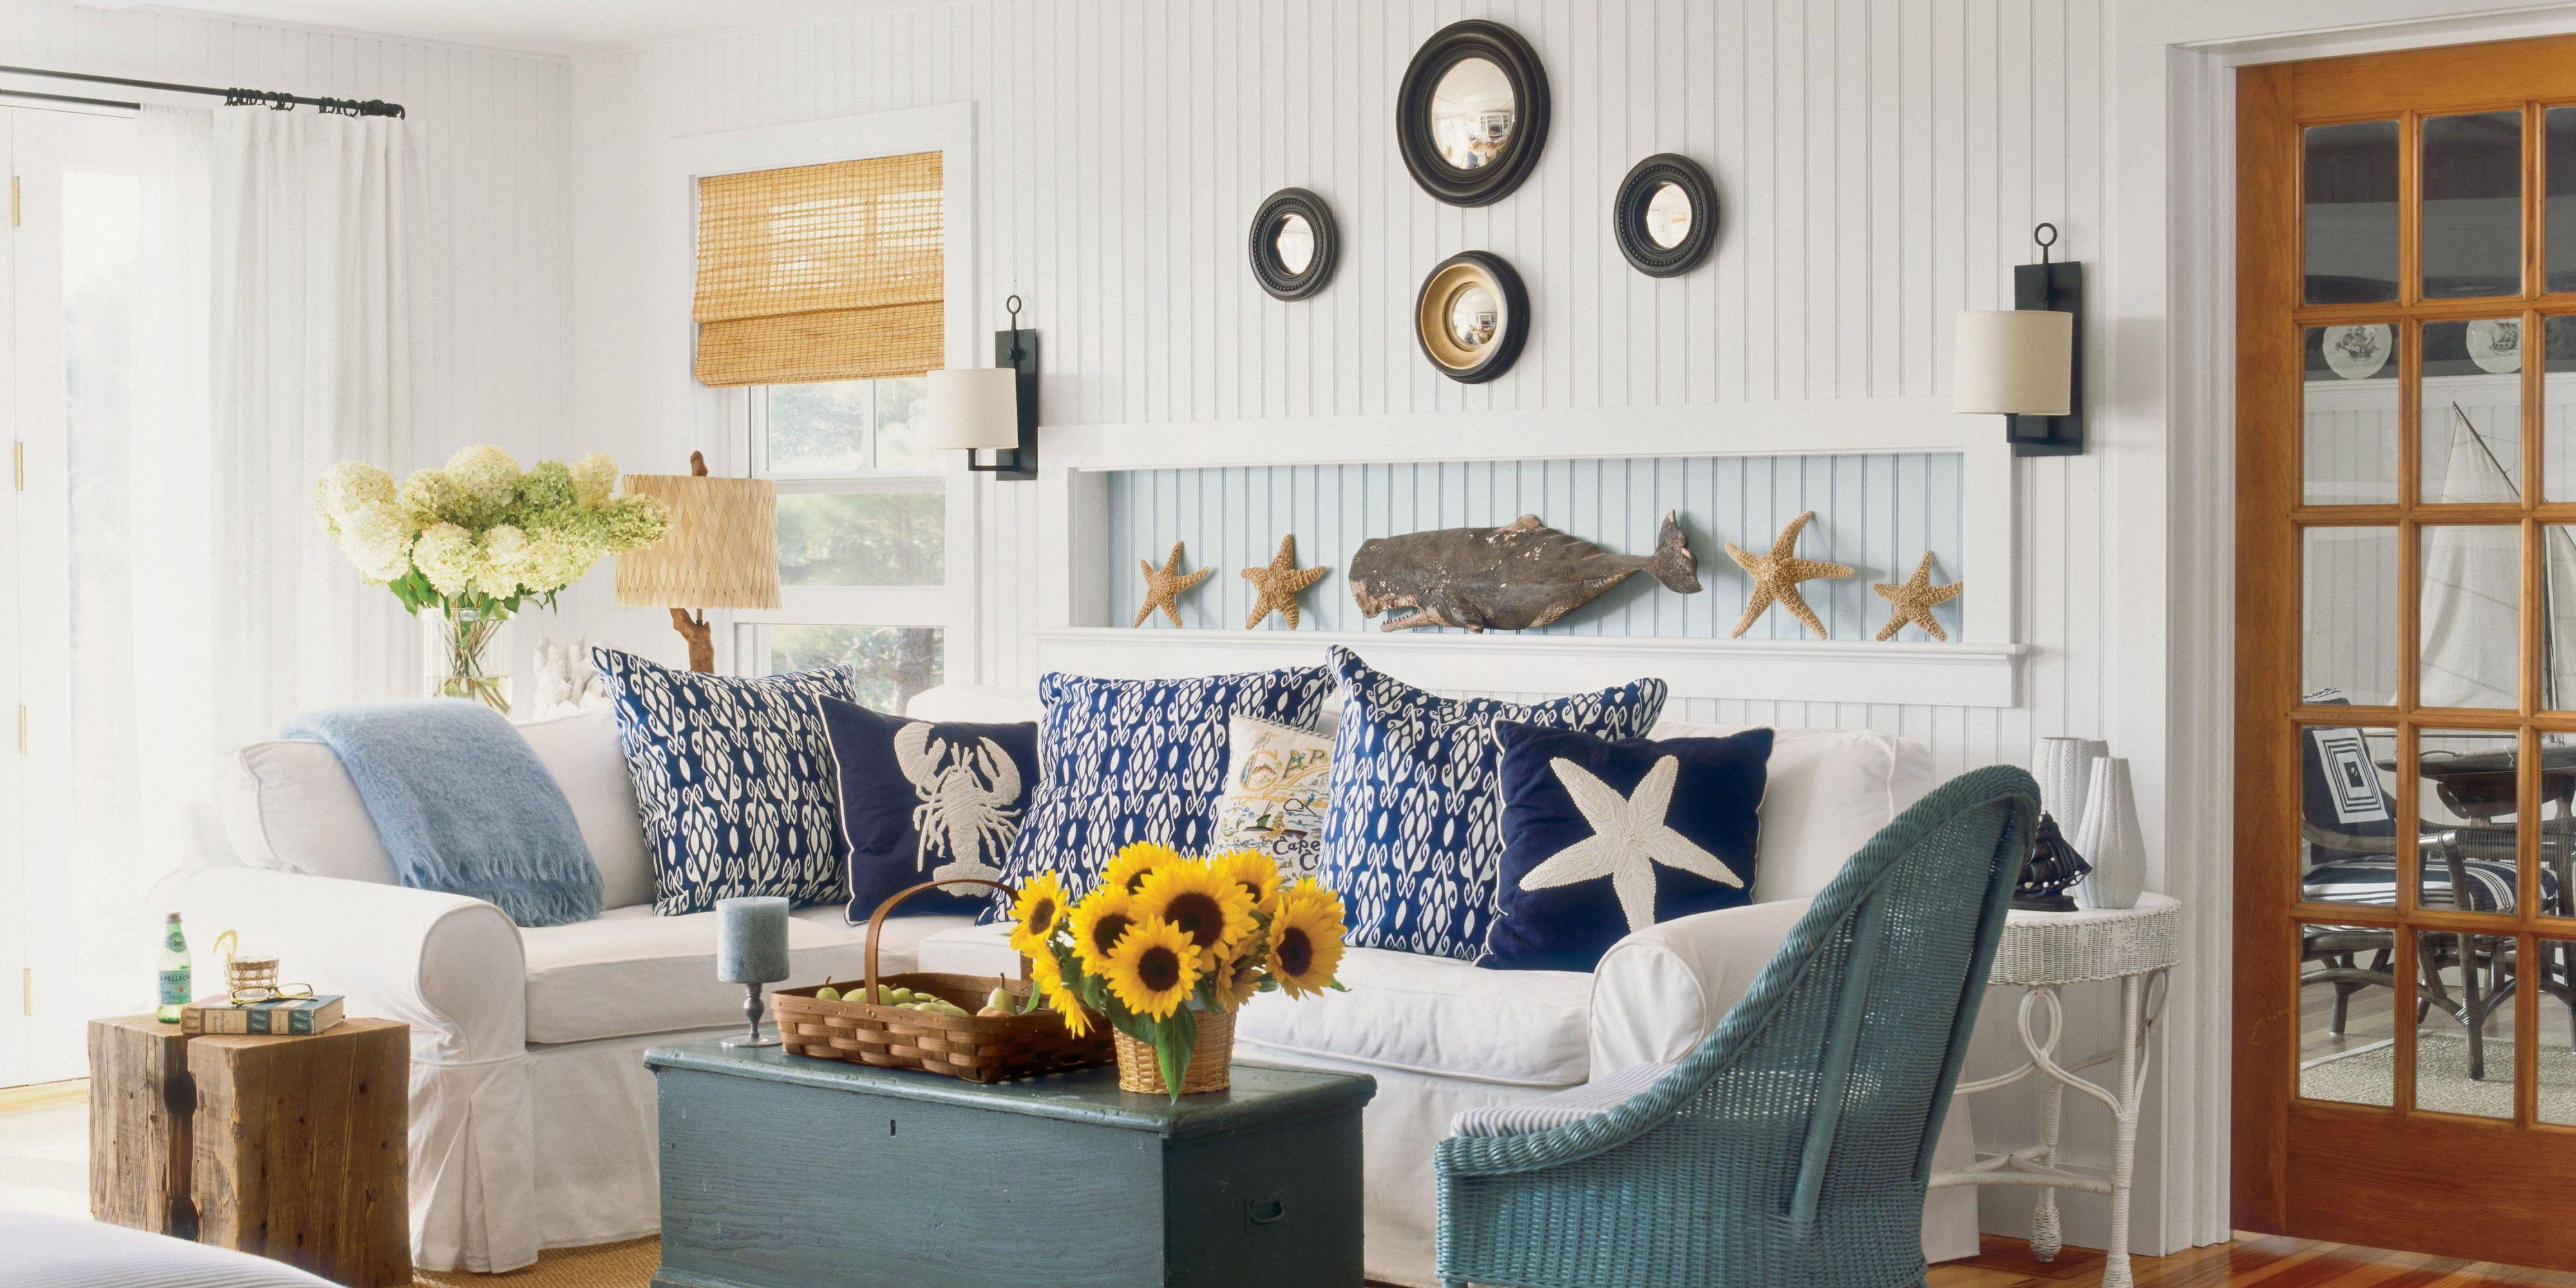 Designer Meredith Hutchison Rebuilds Her Familyu0027s 1950s Cape Cod Cottage.